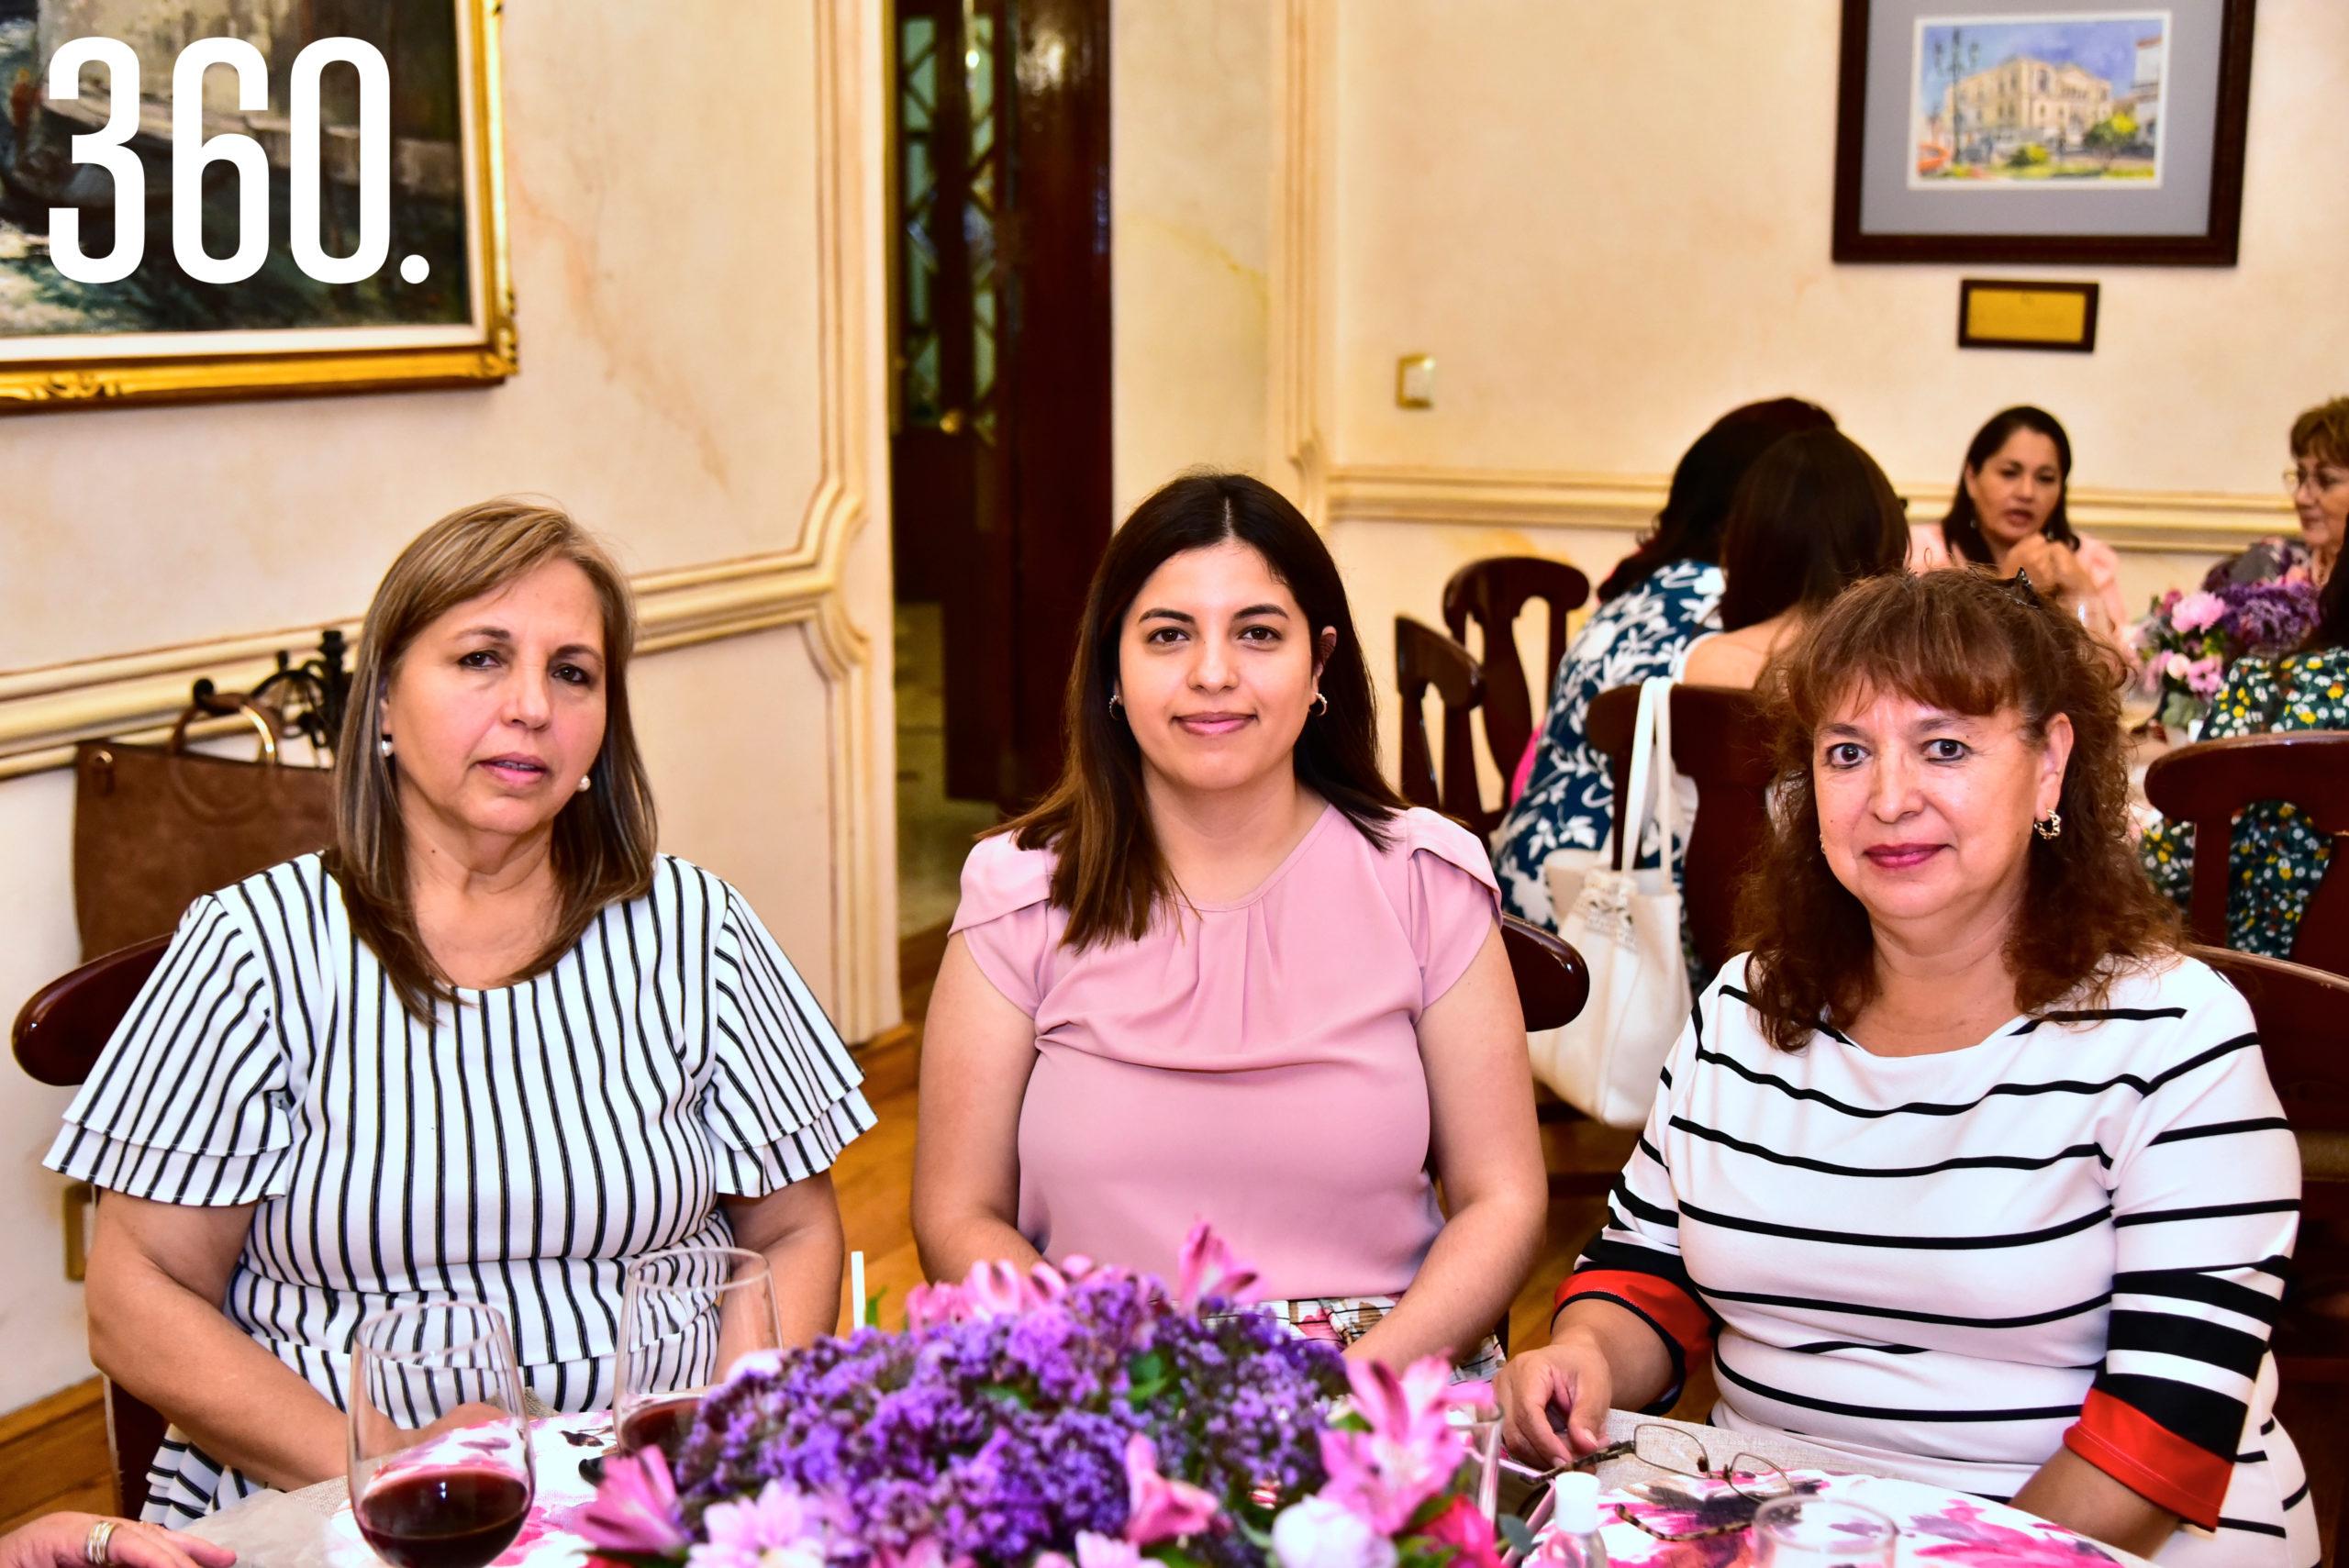 Panchis de la Garza, Berenice Terrazas y Luci González.